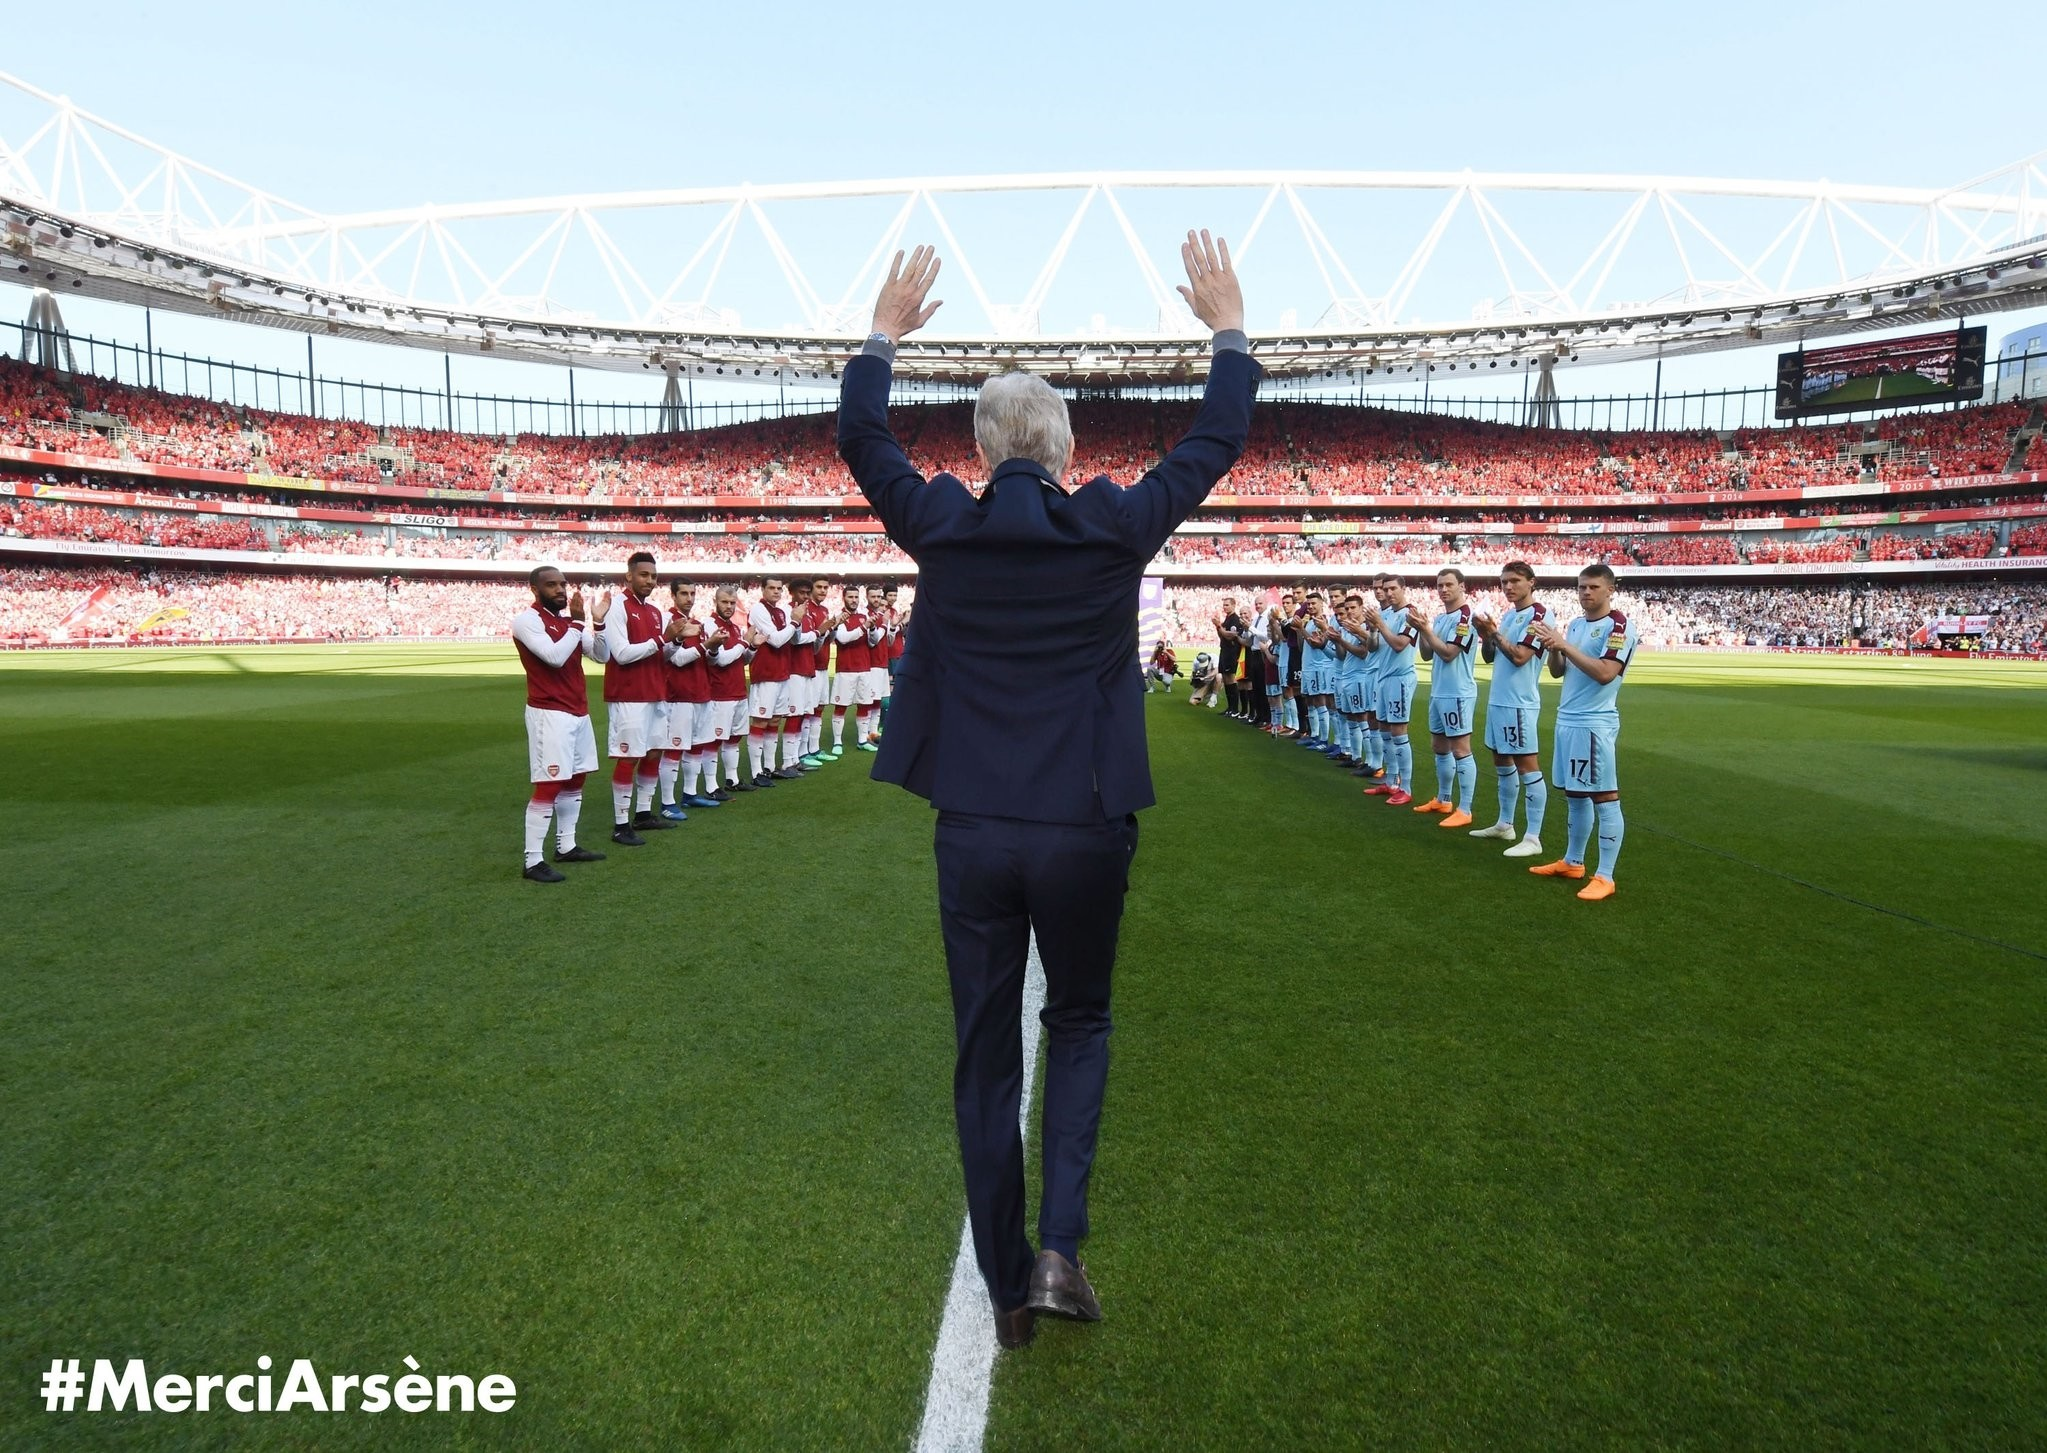 Source: Twitter/@Arsenal